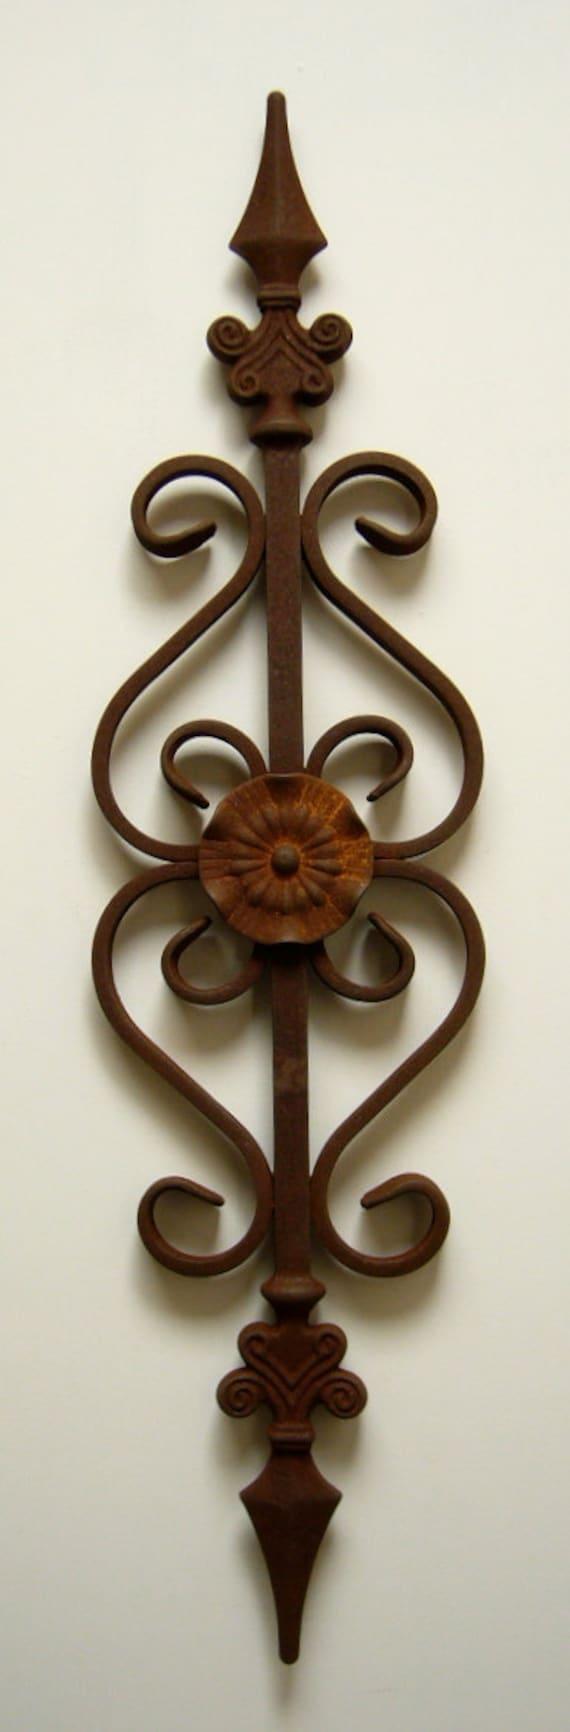 Metal art steel flower scroll southwest natural patina rustic